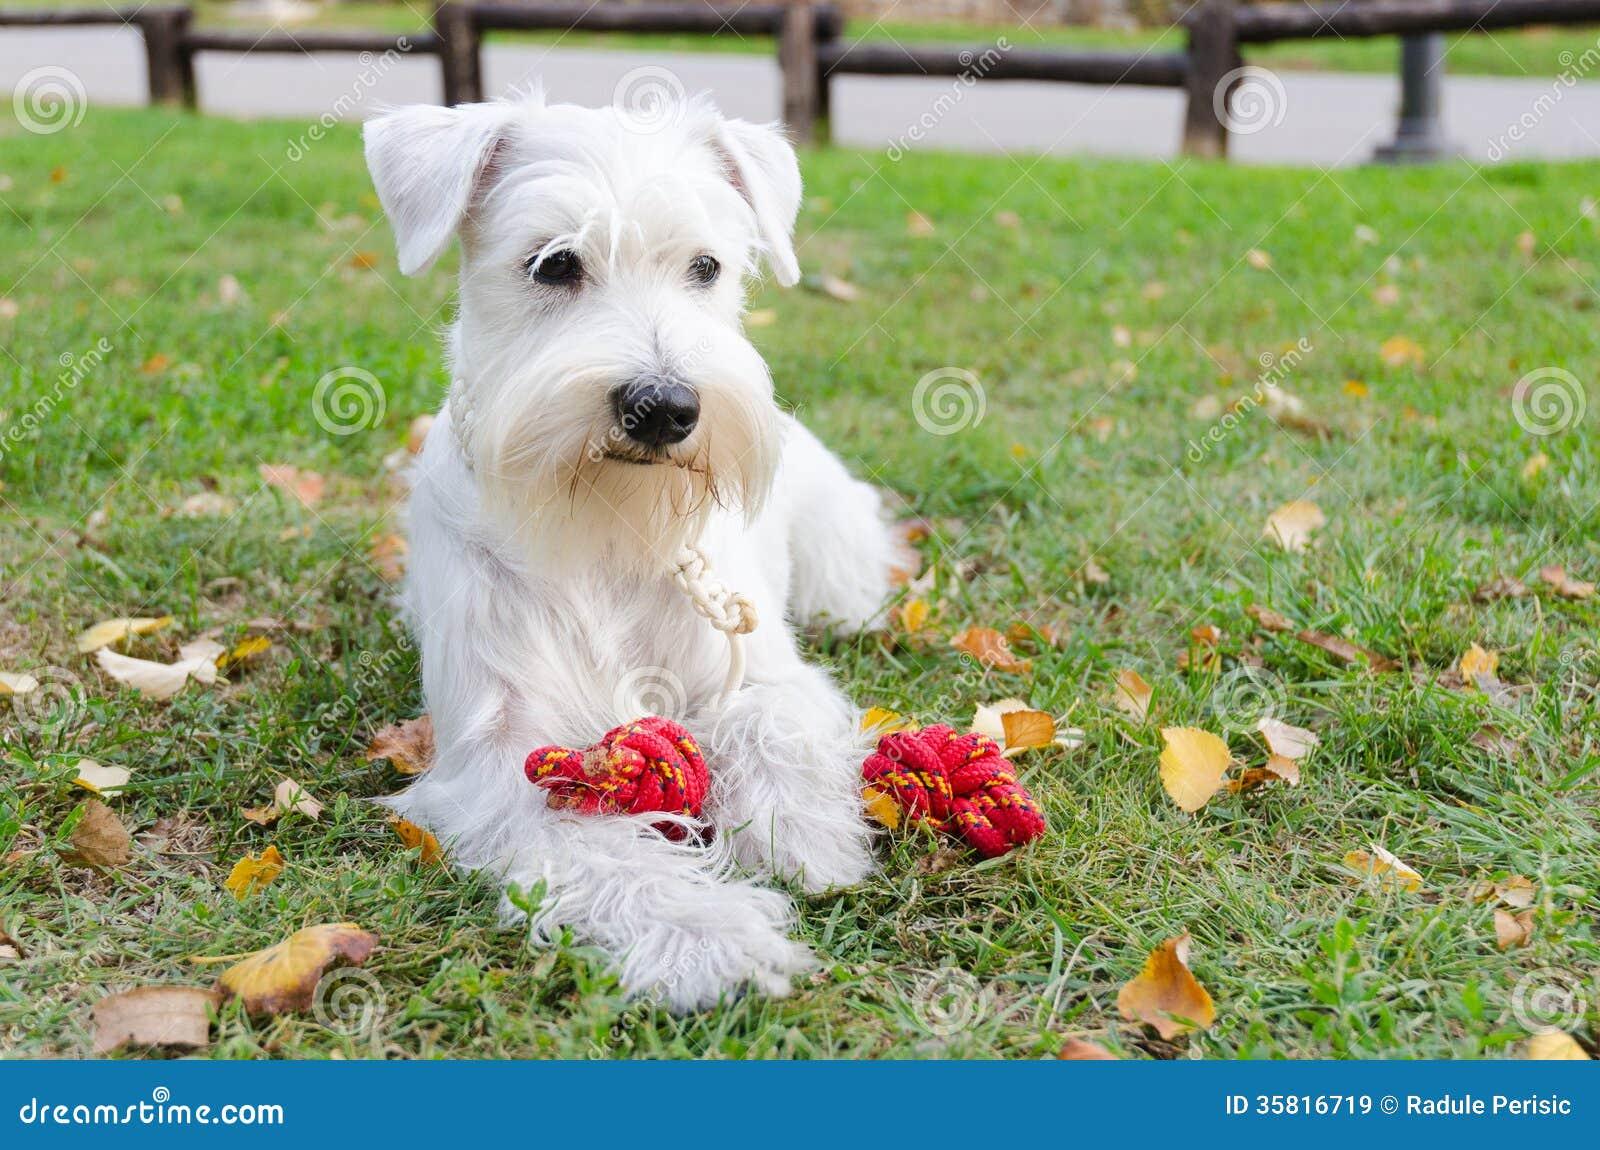 puppies hd wallpaper download